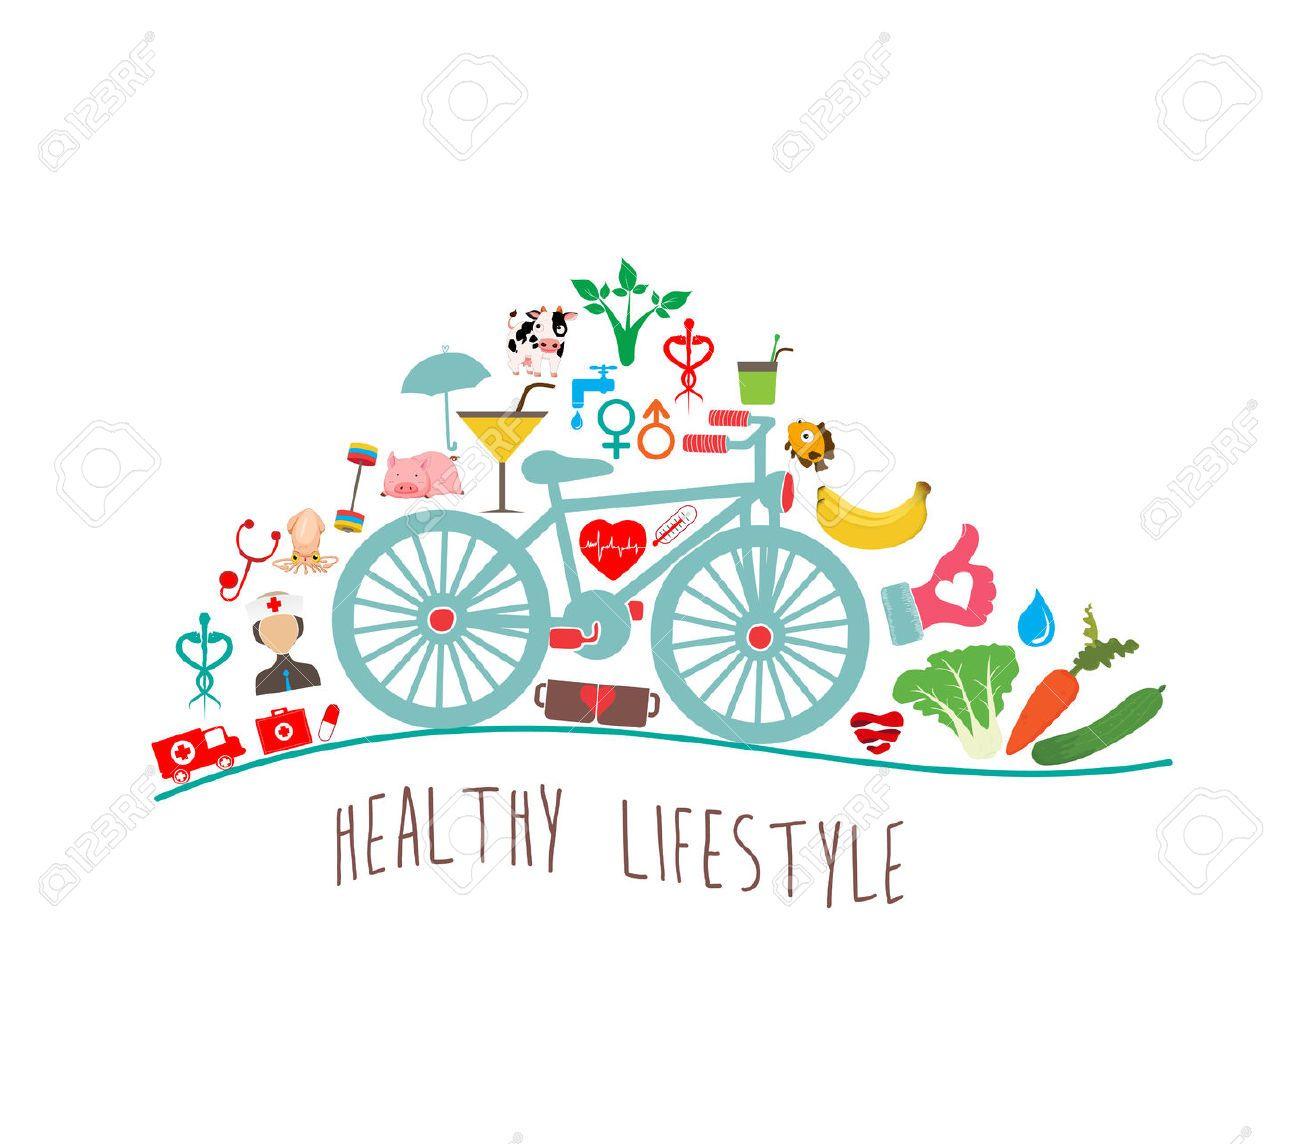 Pin de Maria Emilia en ideas para logo | Healthy lifestyle ...